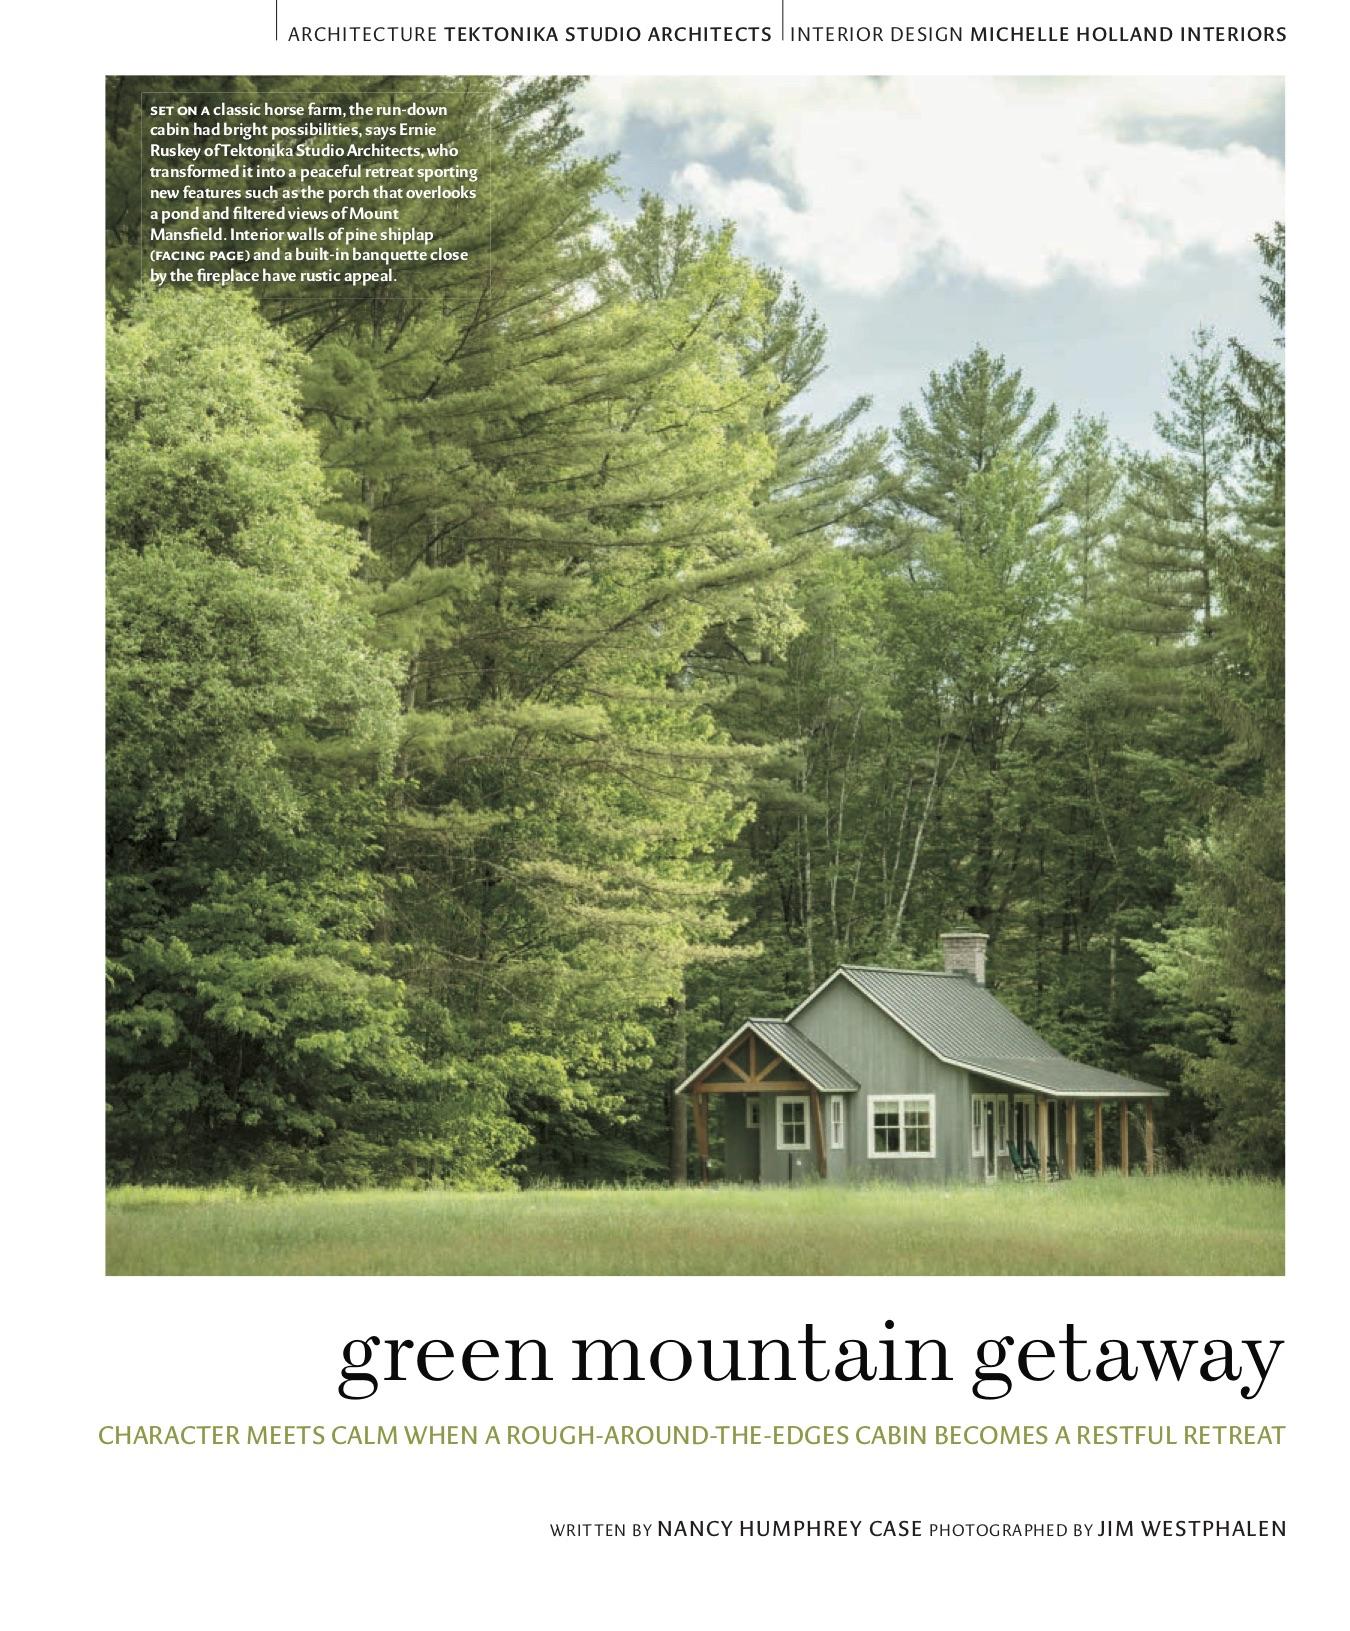 Stowe cabin2.jpg